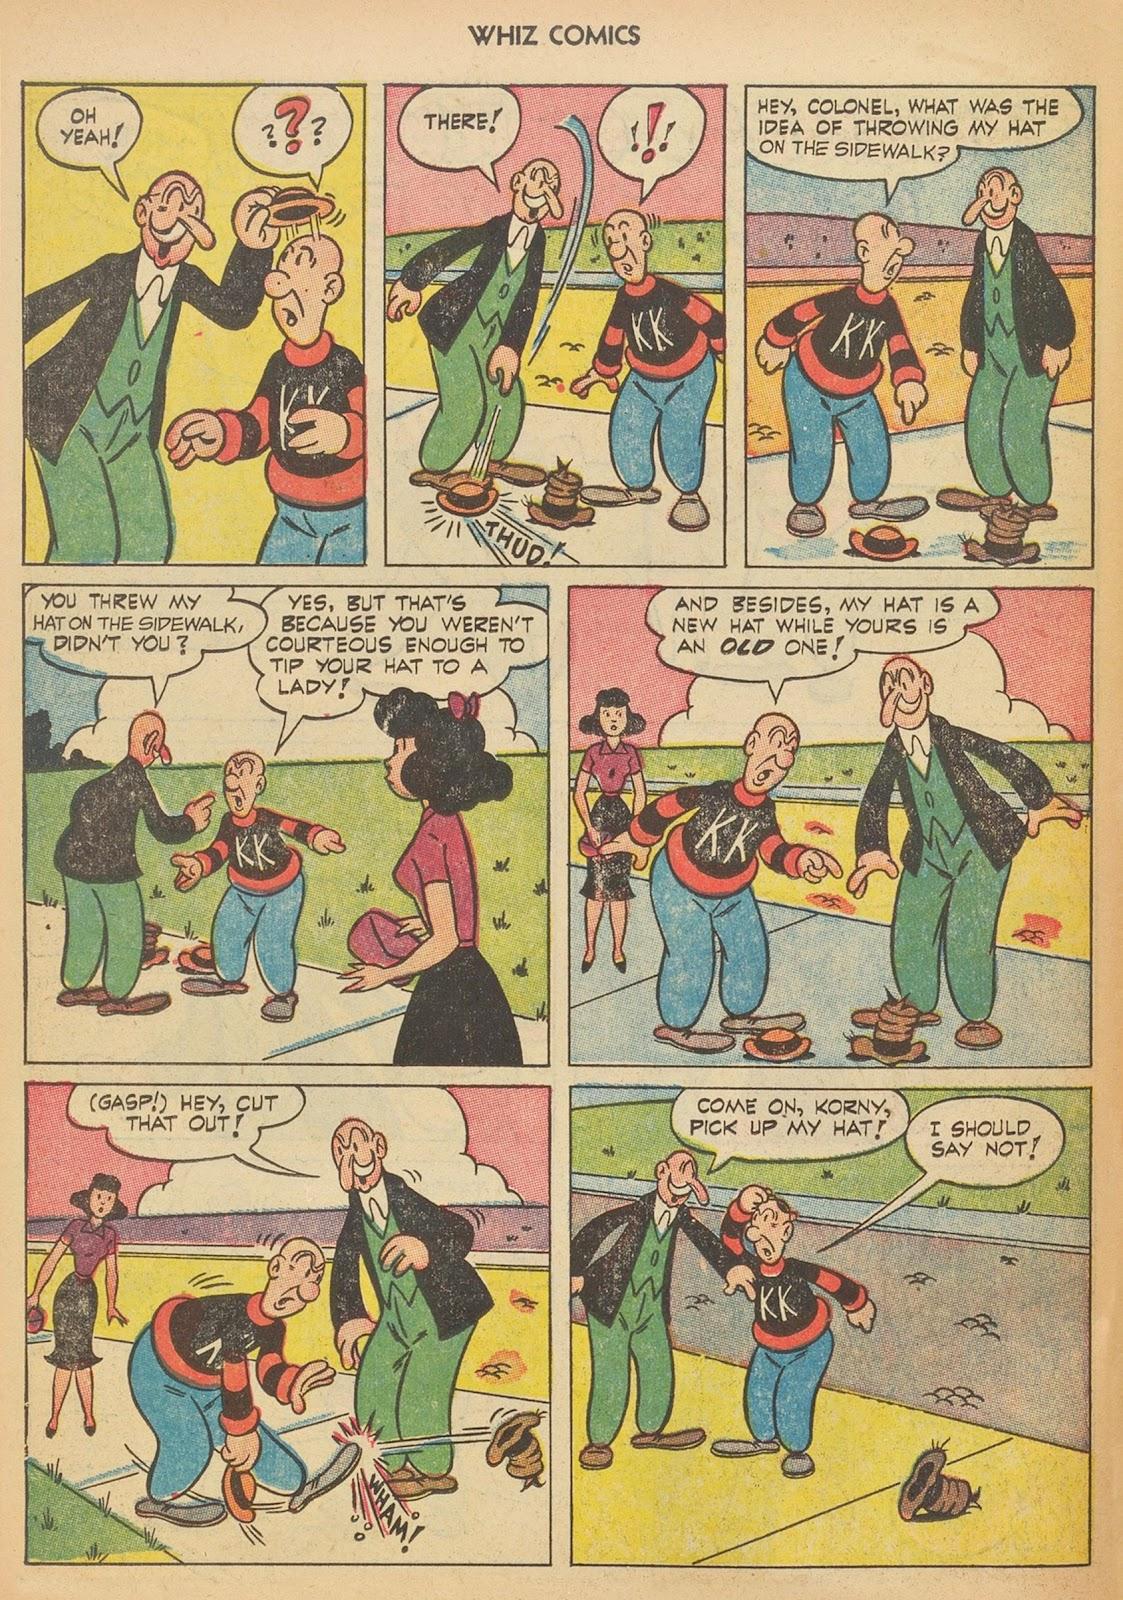 Read online WHIZ Comics comic -  Issue #153 - 26